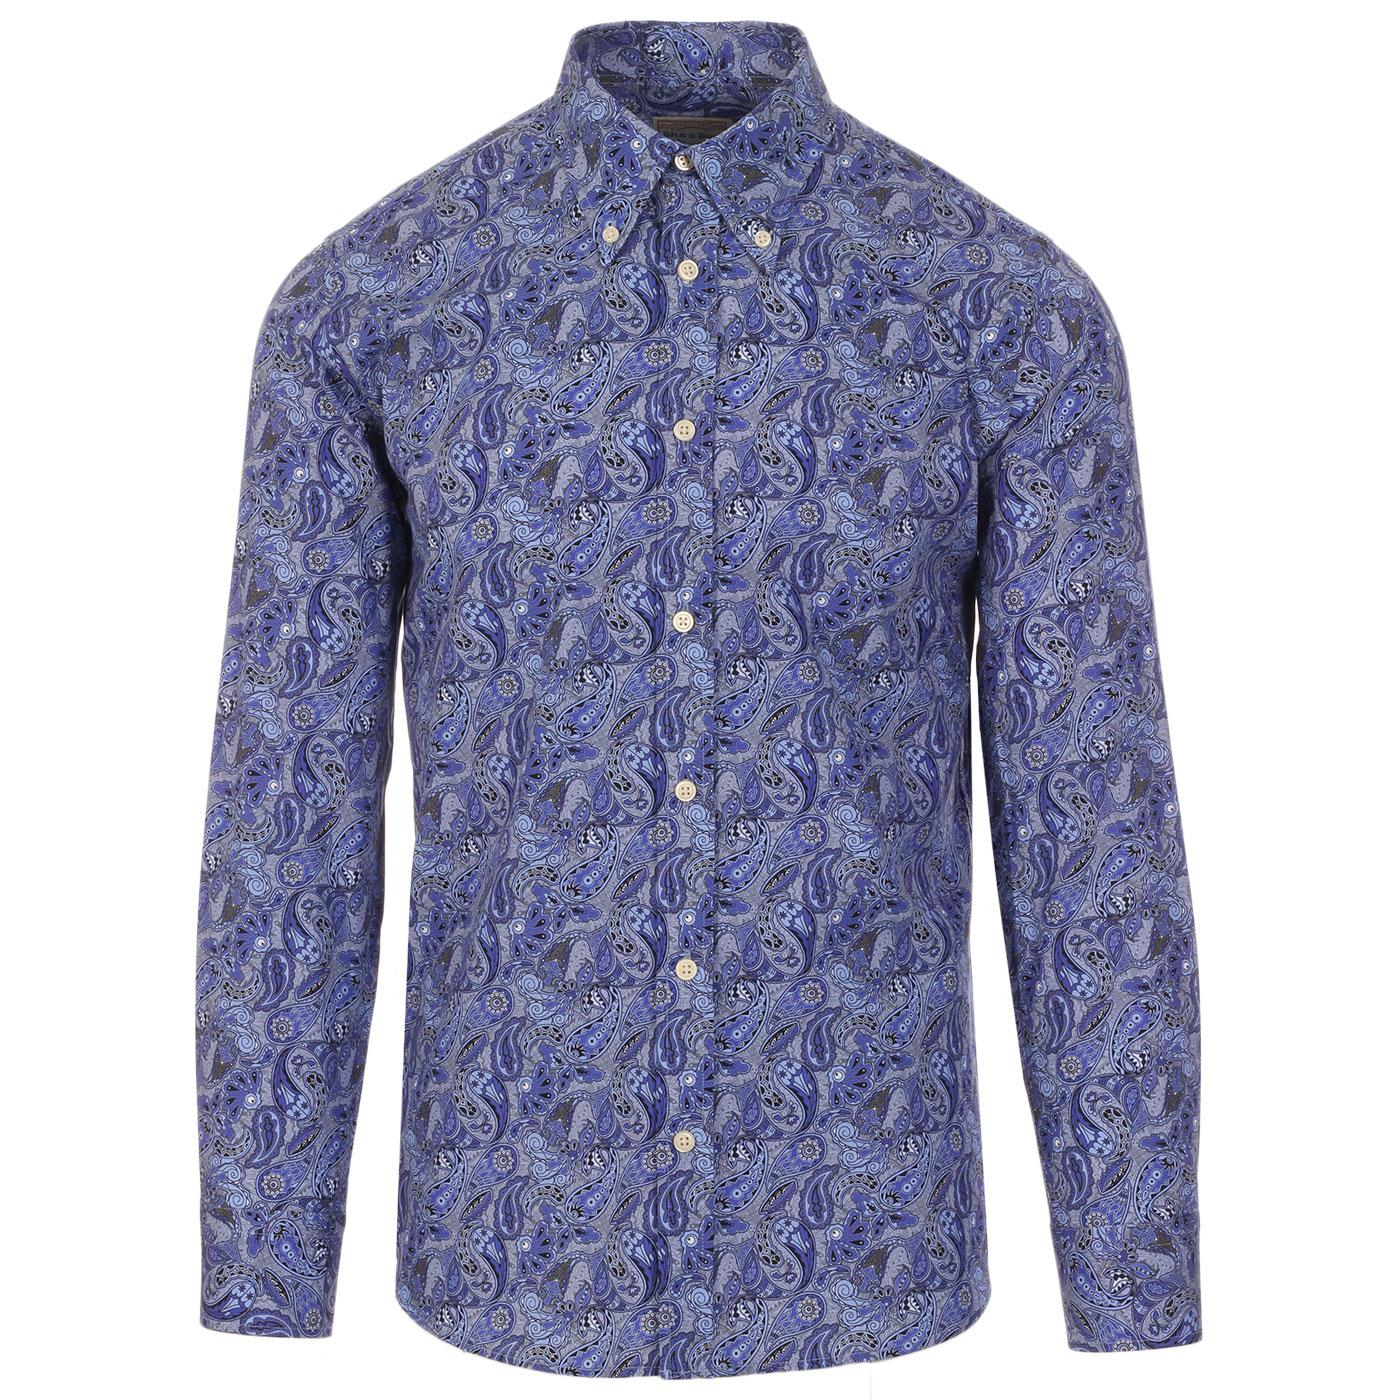 SKA & SOUL 60s Mod Psychedelic Paisley BD Shirt